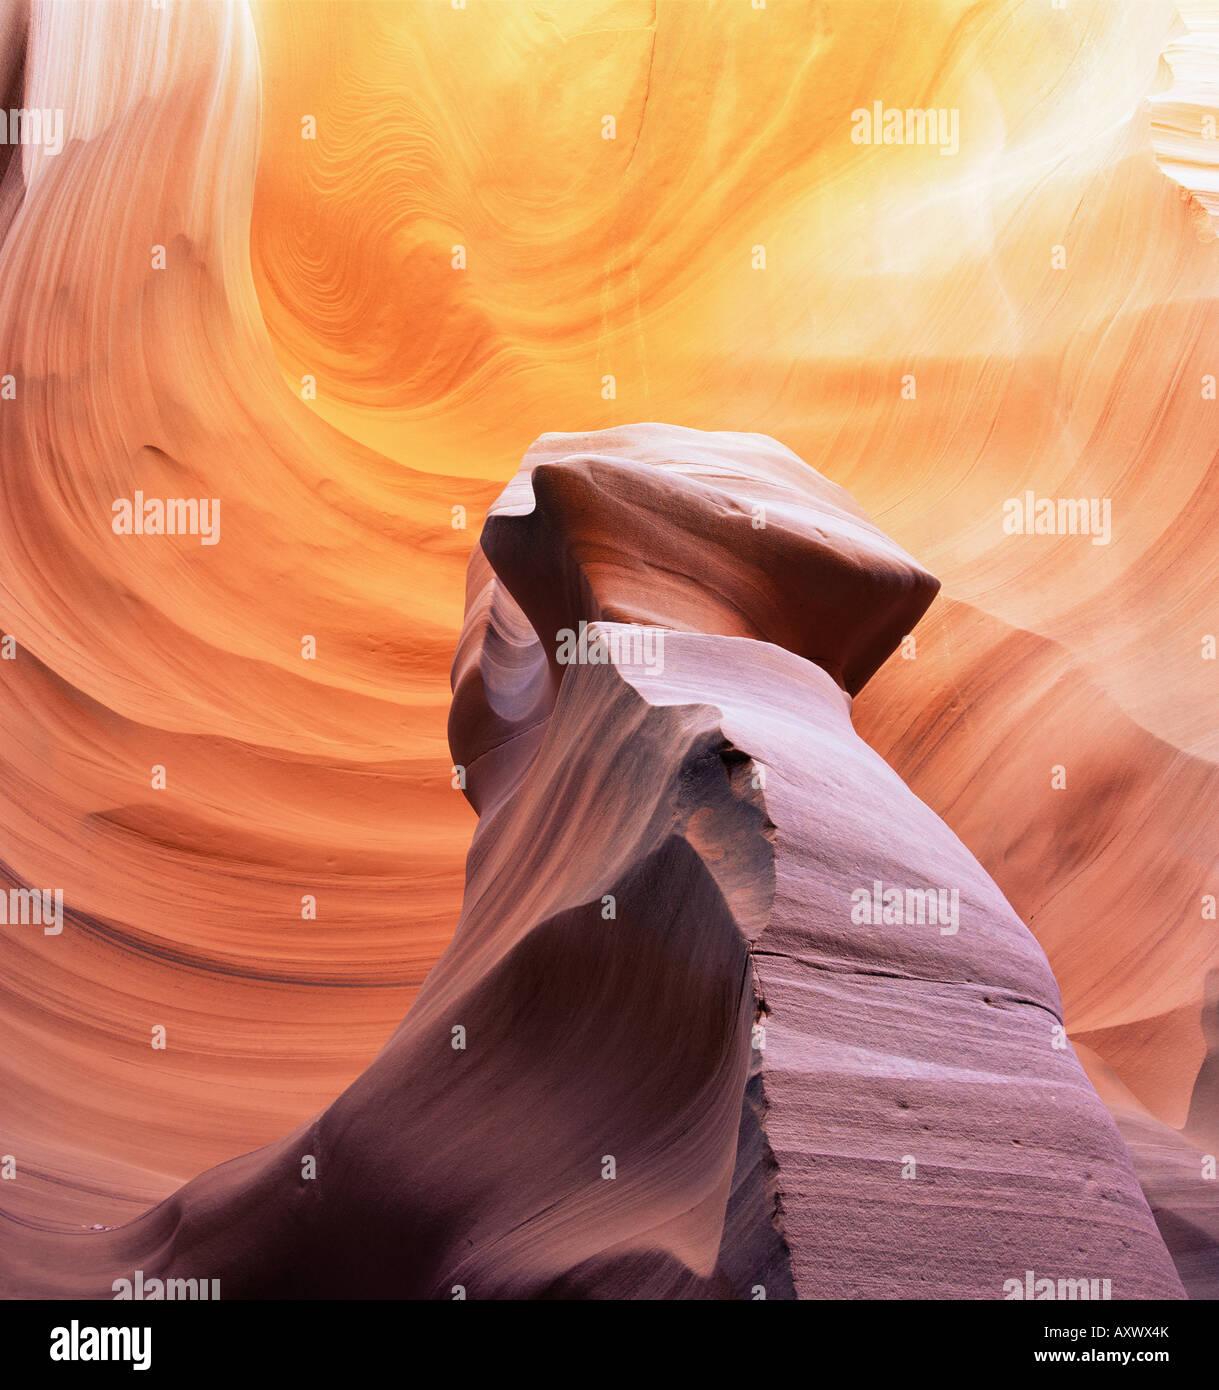 Pilar de piedra en Thin Lizy Canyon, una ranura canyon, en Arizona, Estados Unidos de América (EE.UU.), América Foto de stock